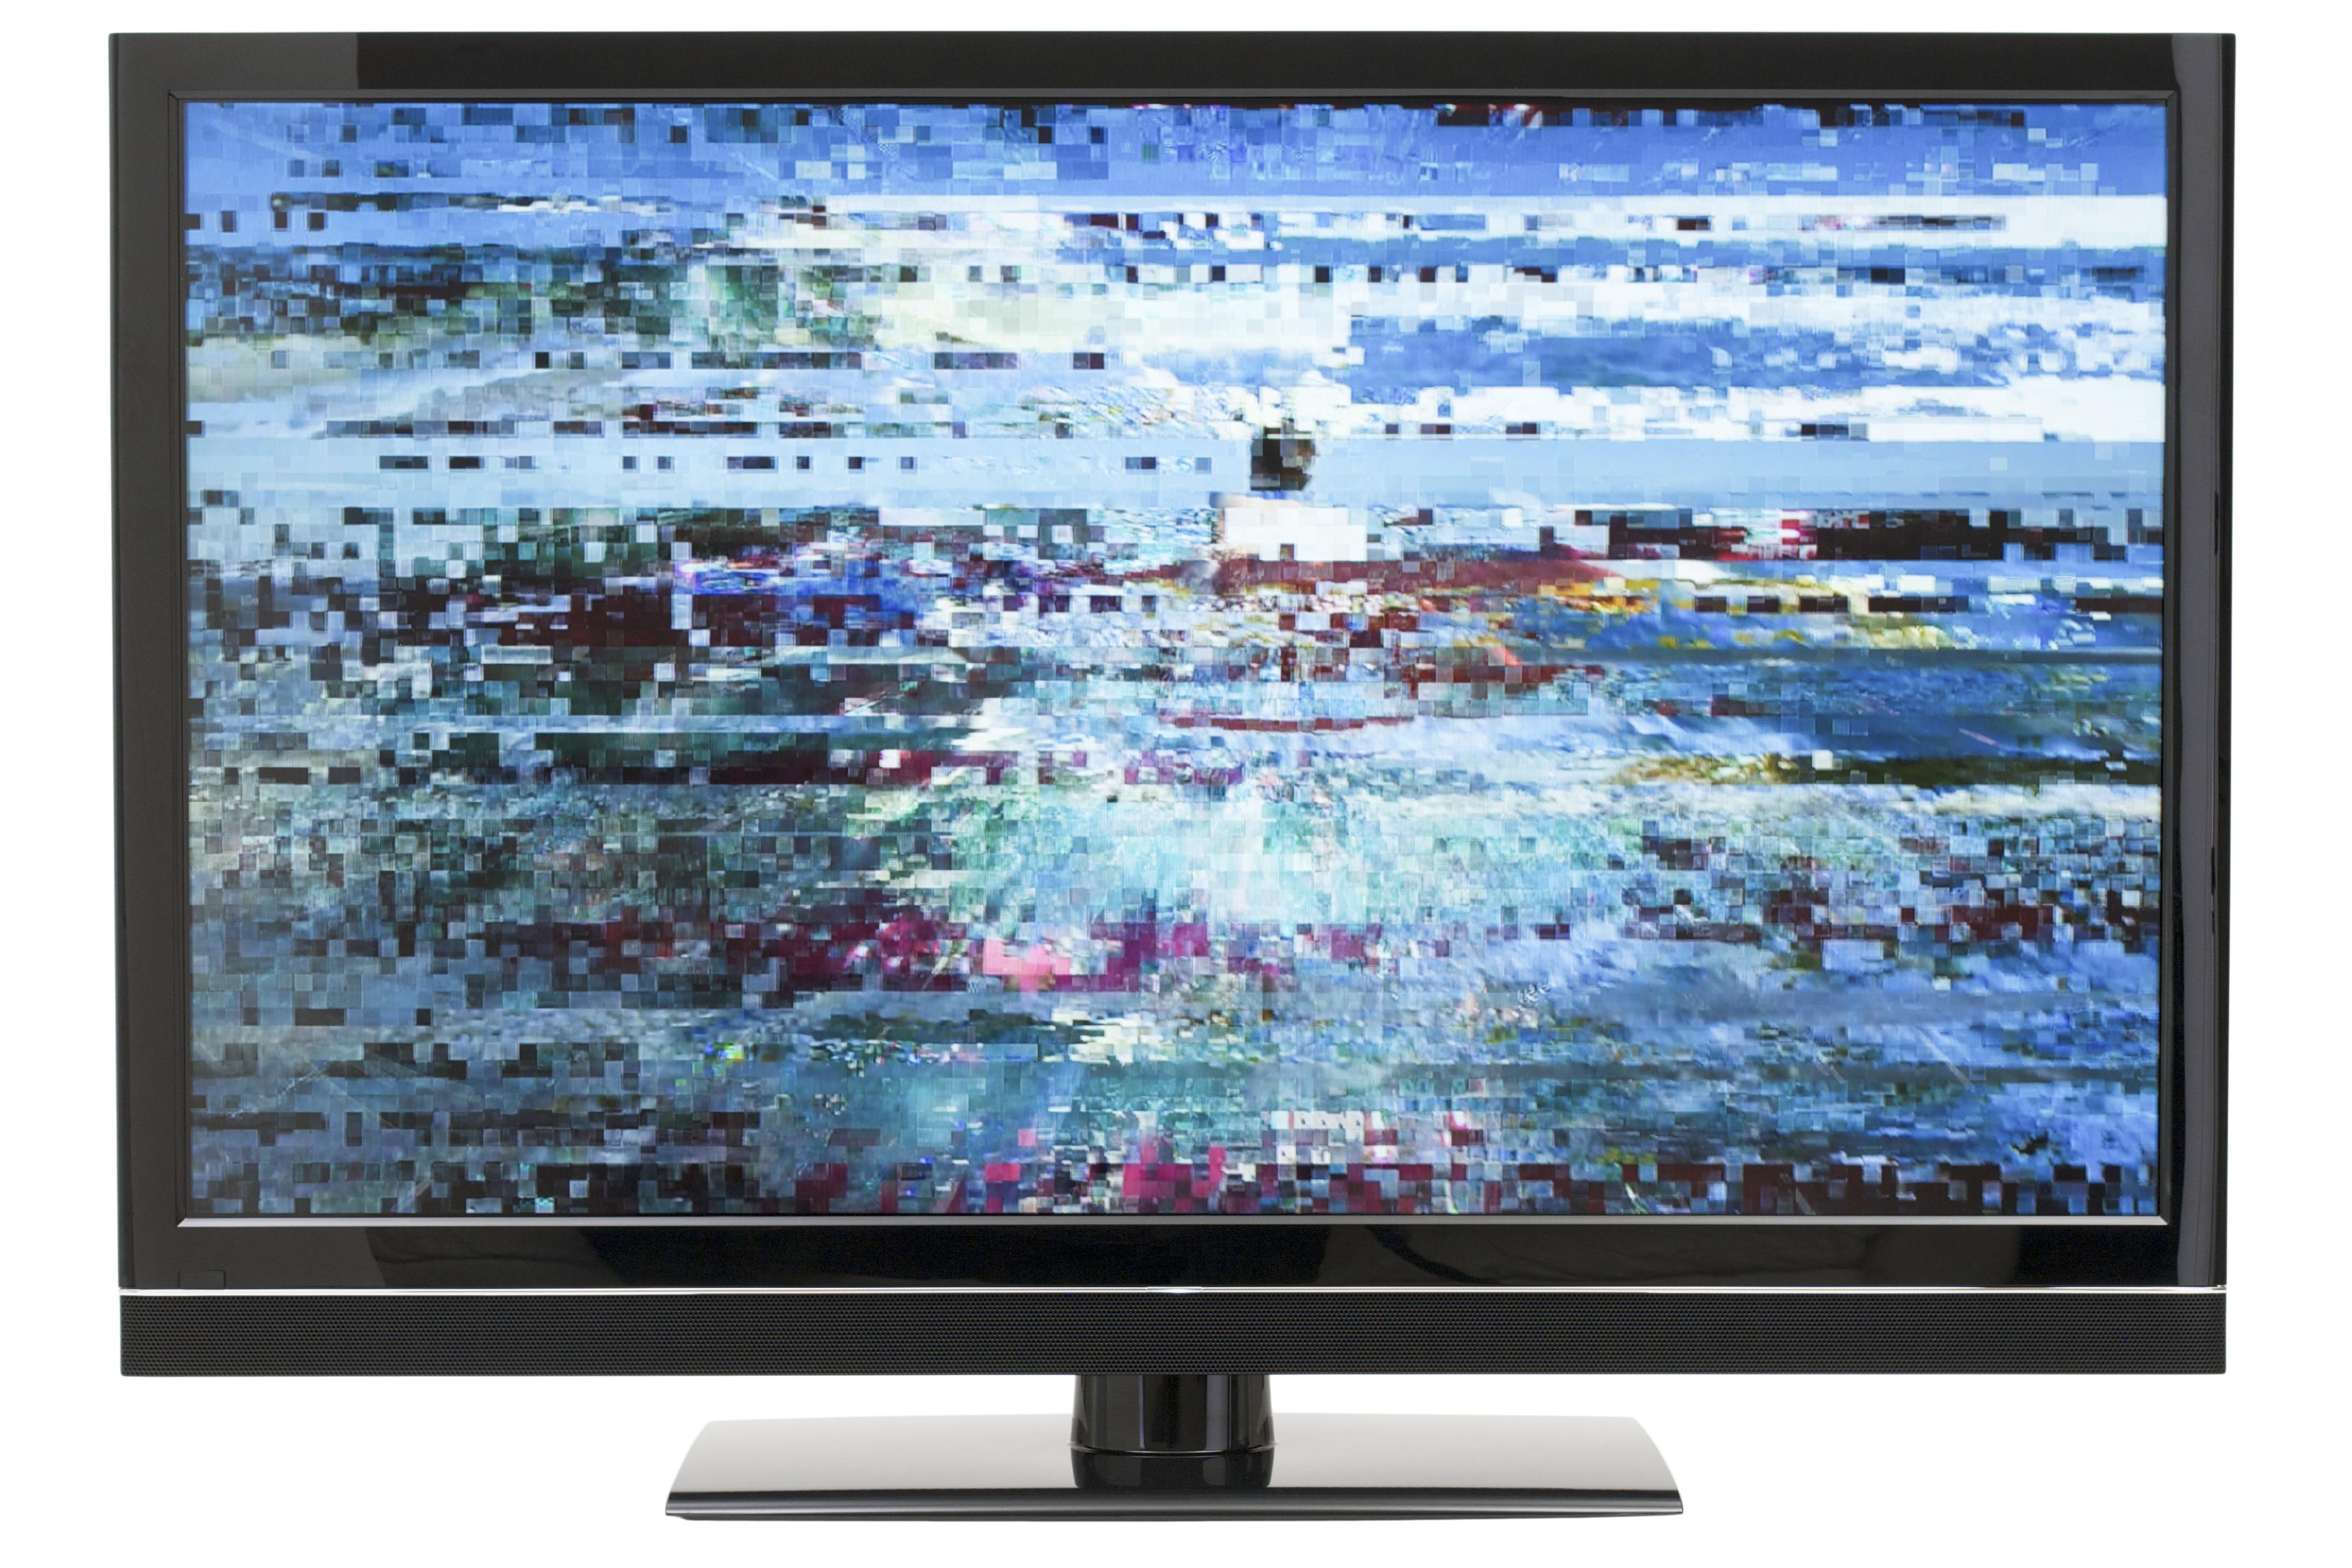 Fuzzy TV